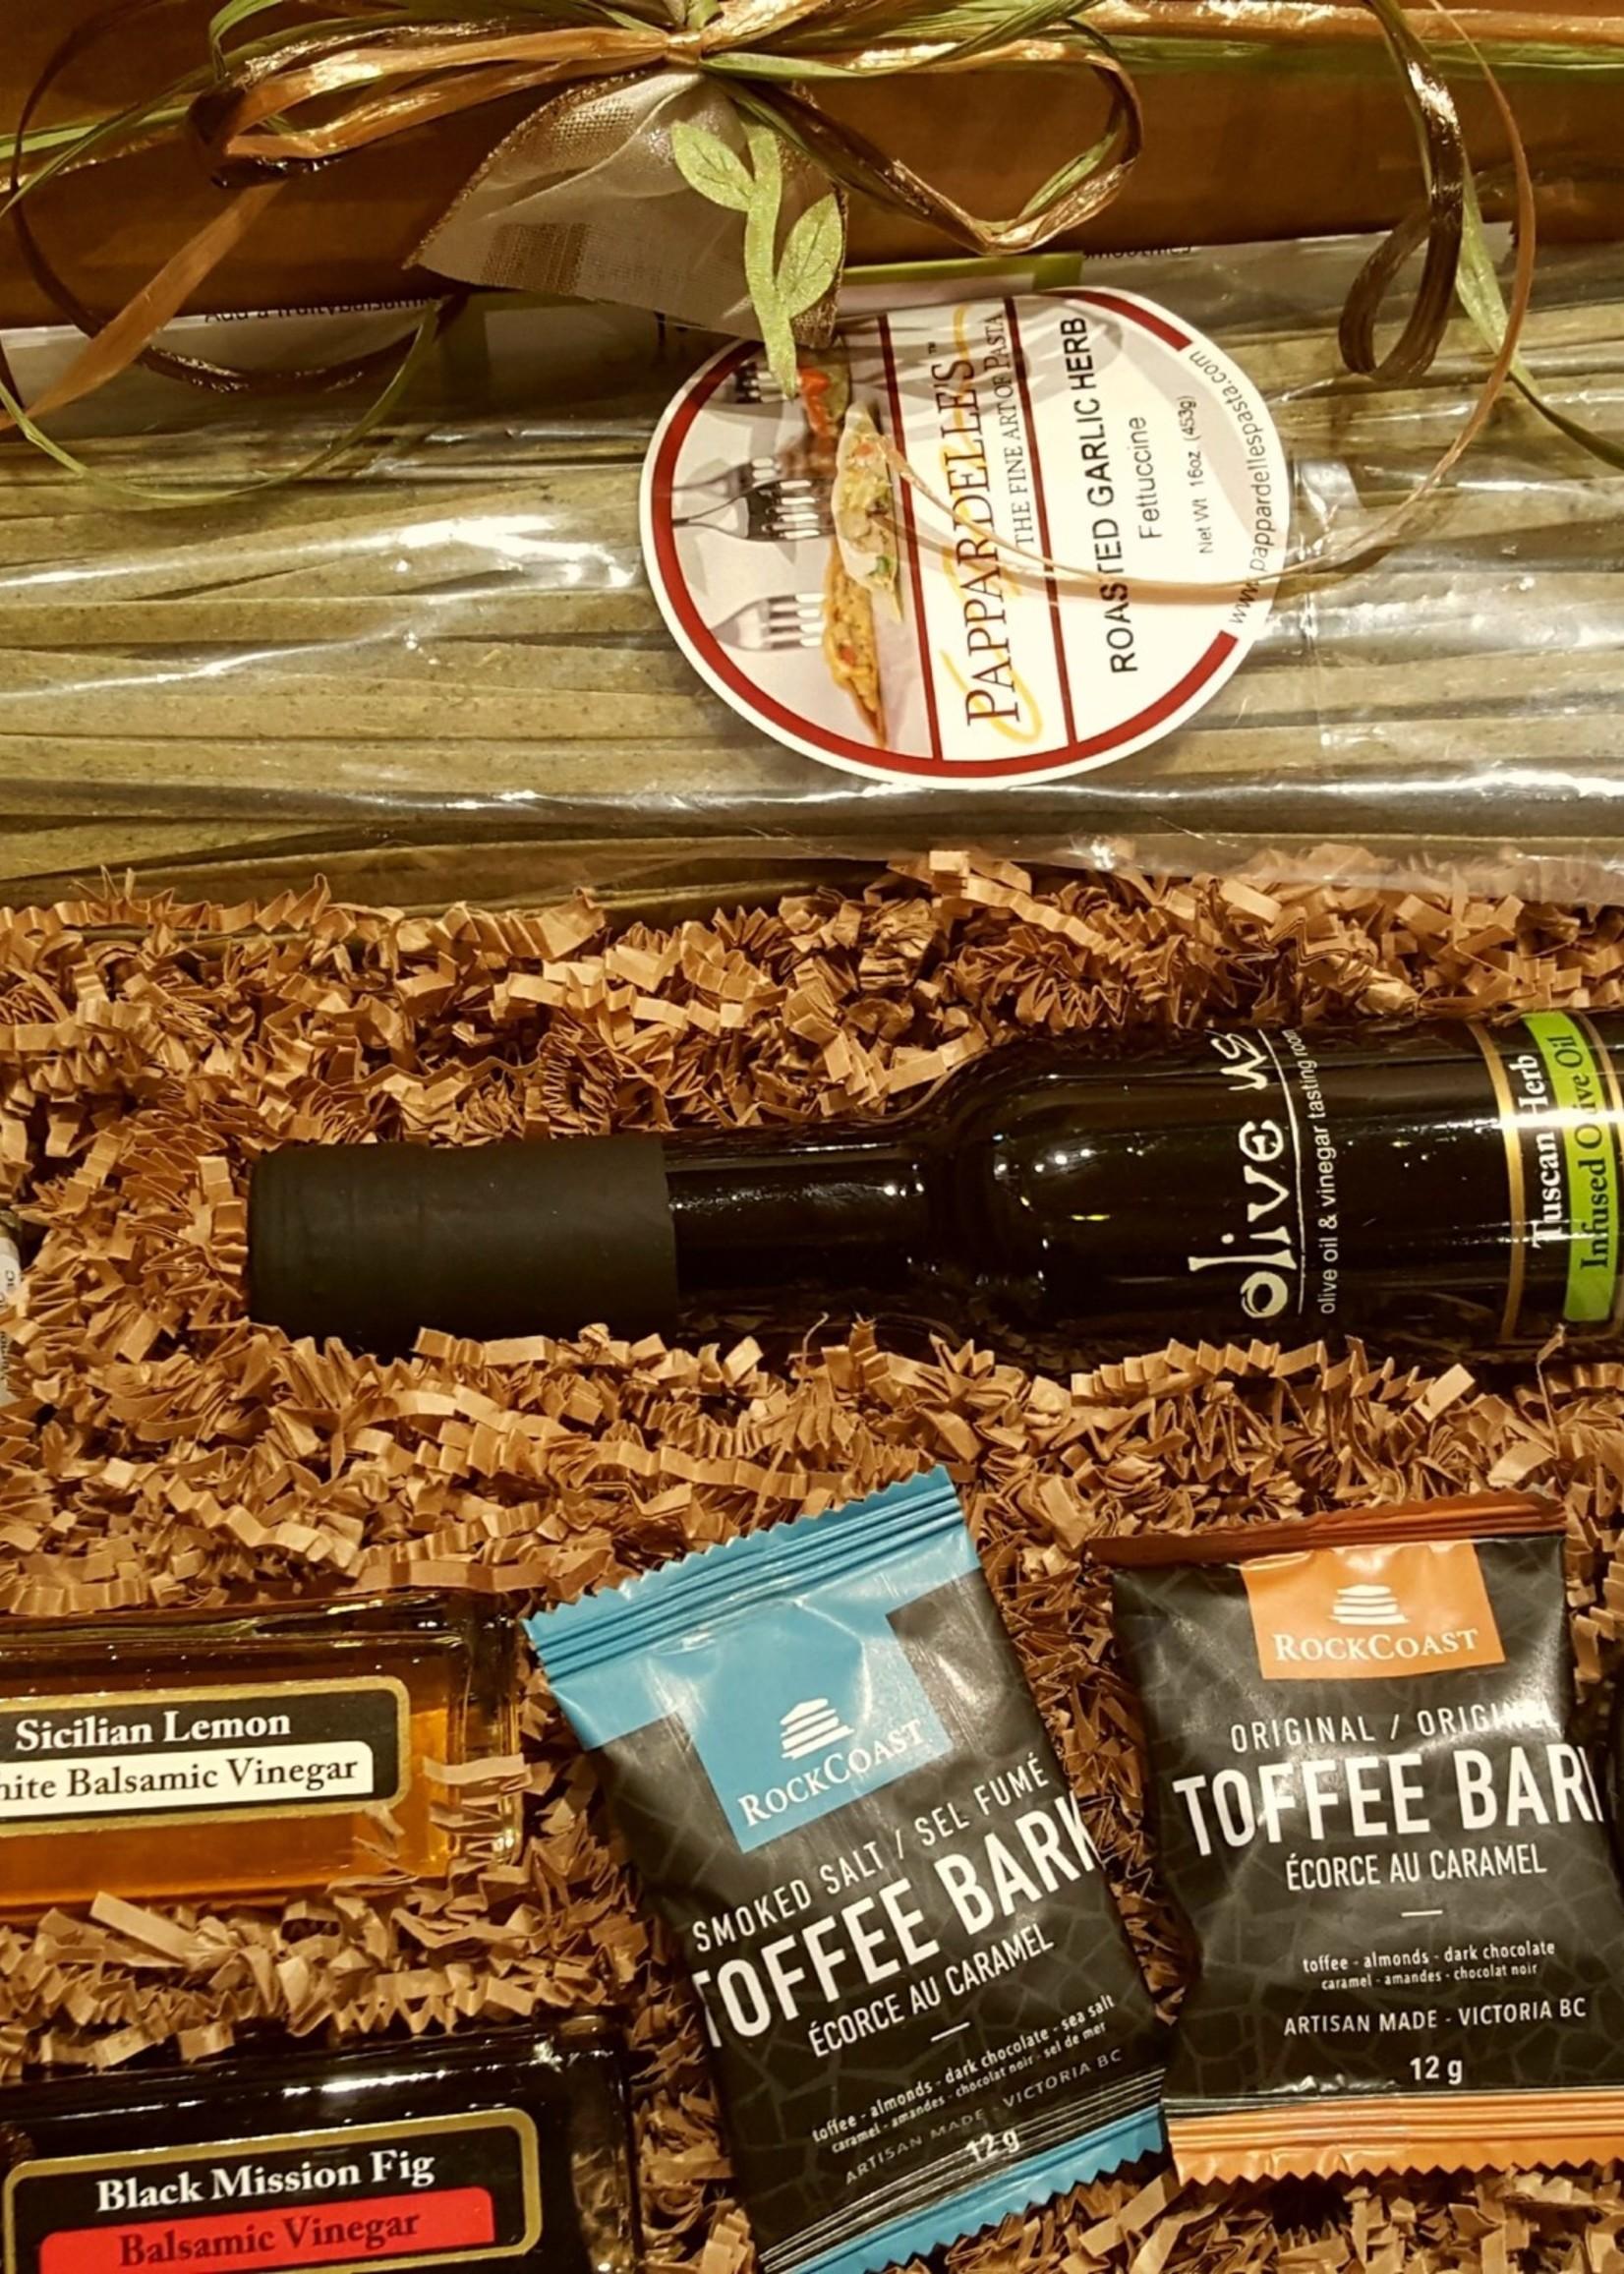 Olive Us Pasta Gift Box-Roasted Garlic Herb